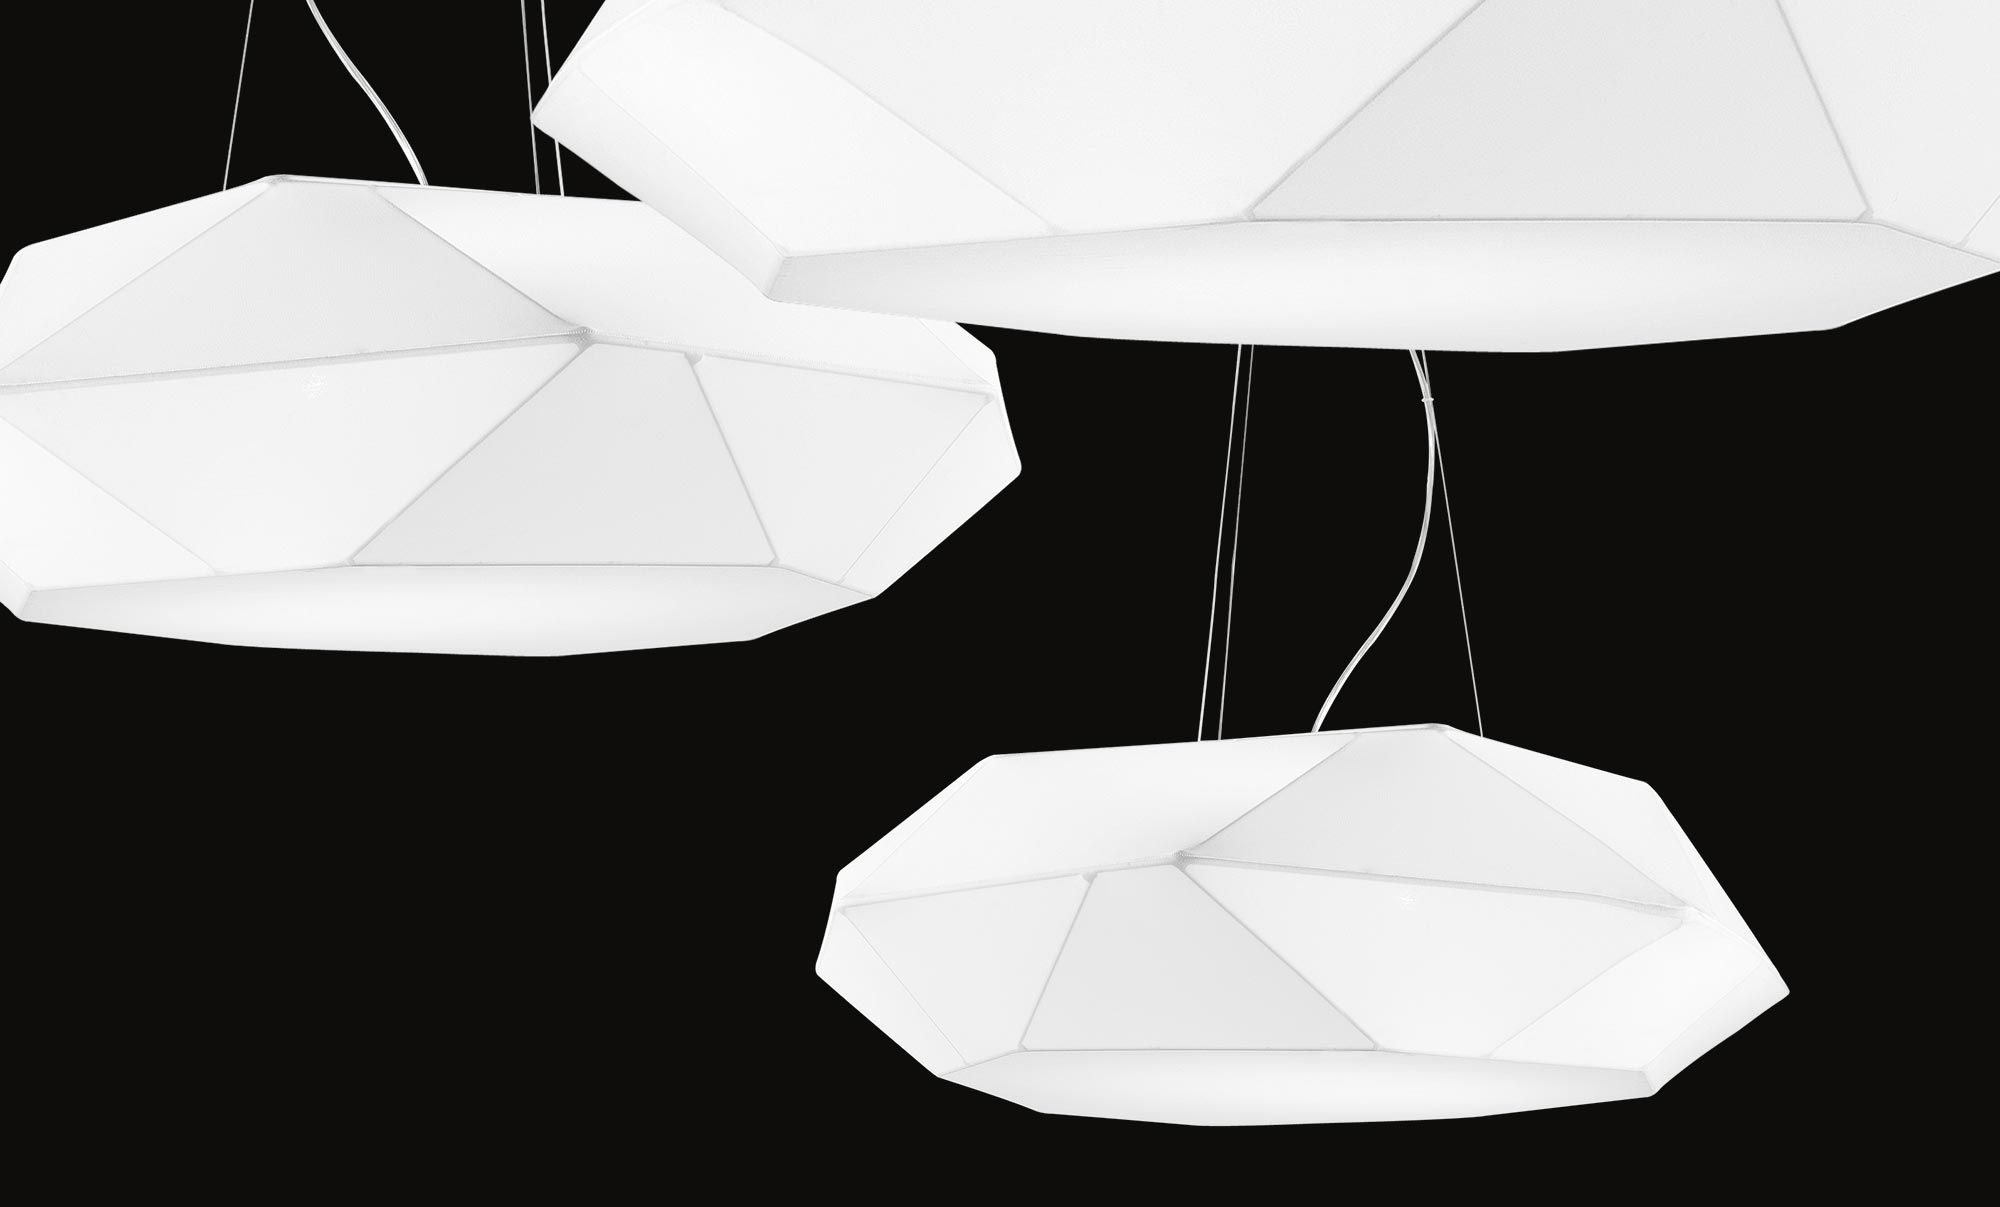 Plafoniere Da Soffitto In Tessuto : Panzeri viki lampade da soffitto e sospensioni in tessuto